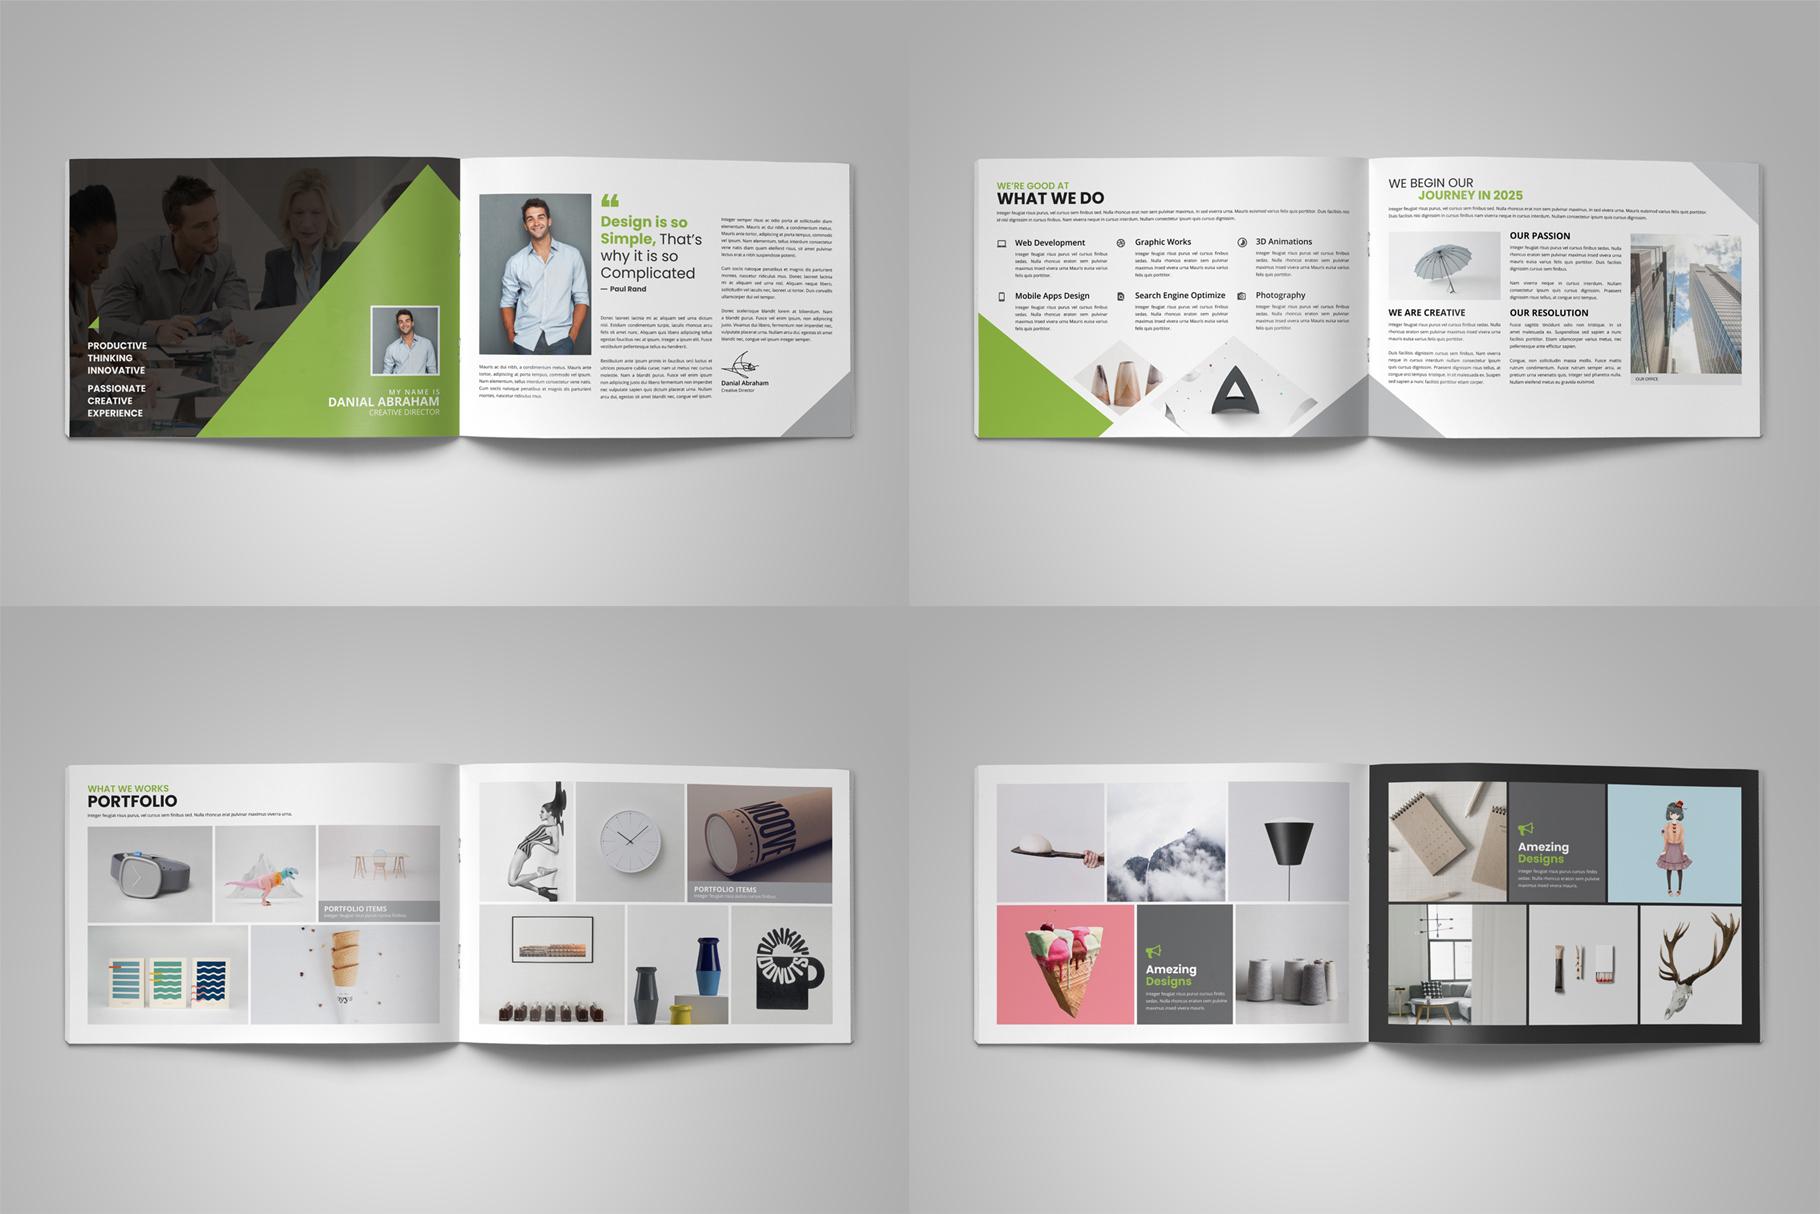 Digital Agency Portfolio Brochure v2 example image 13